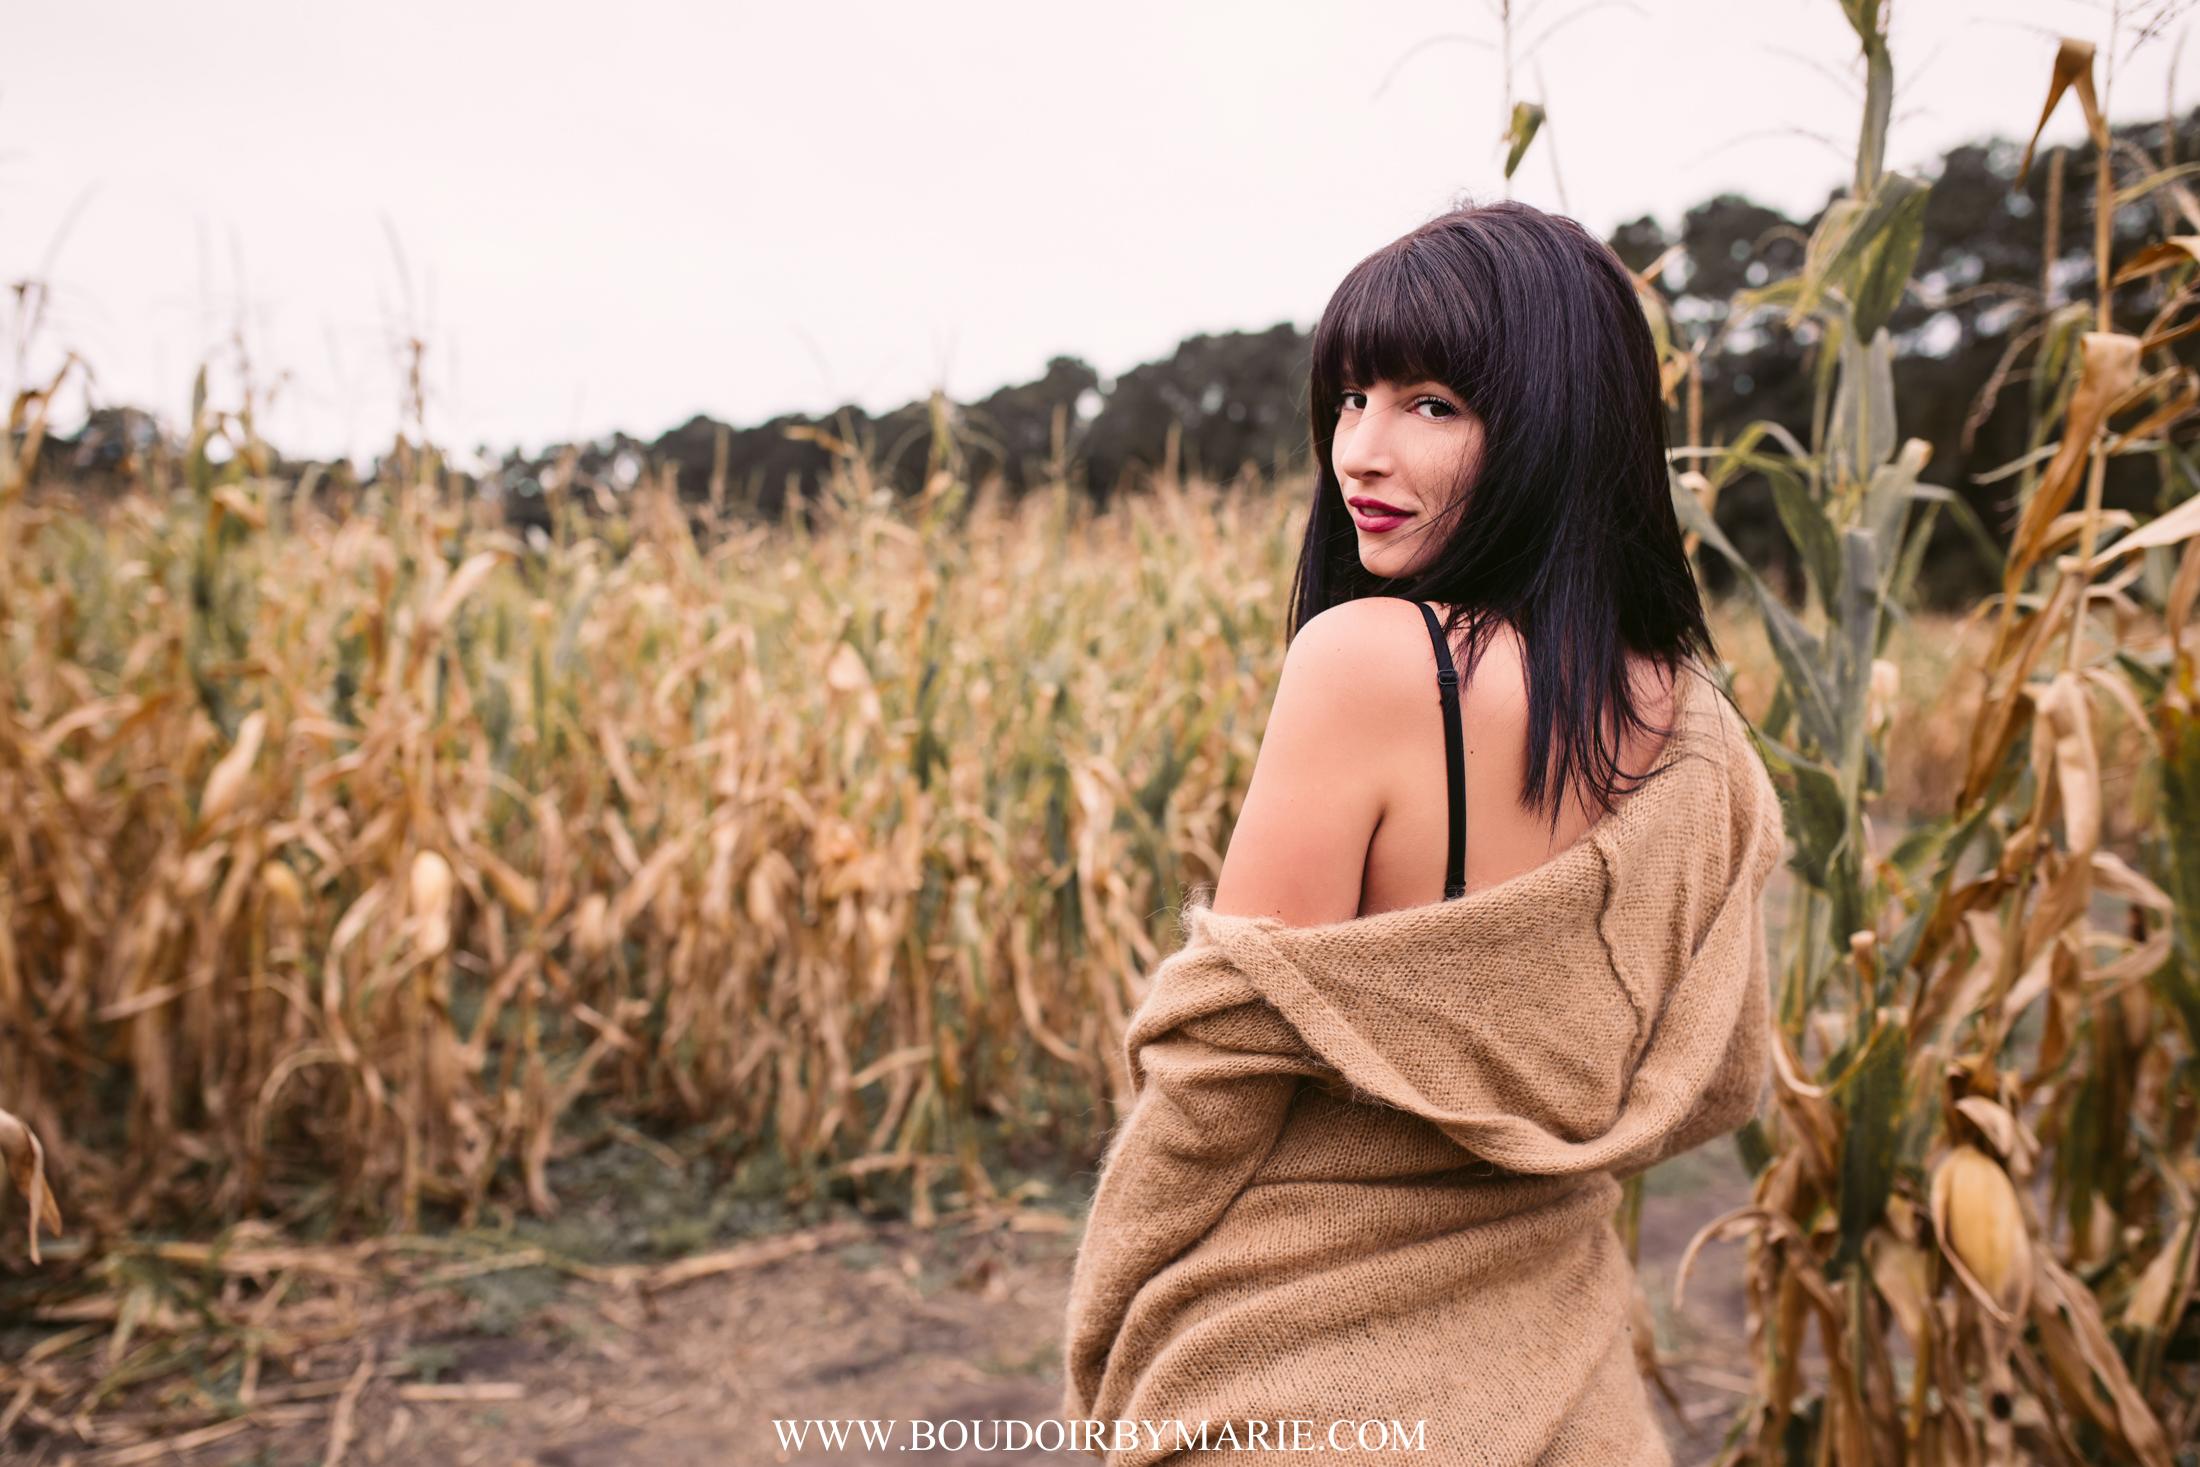 BoudoirbyMarie-AutumnBoudoir-8.jpg